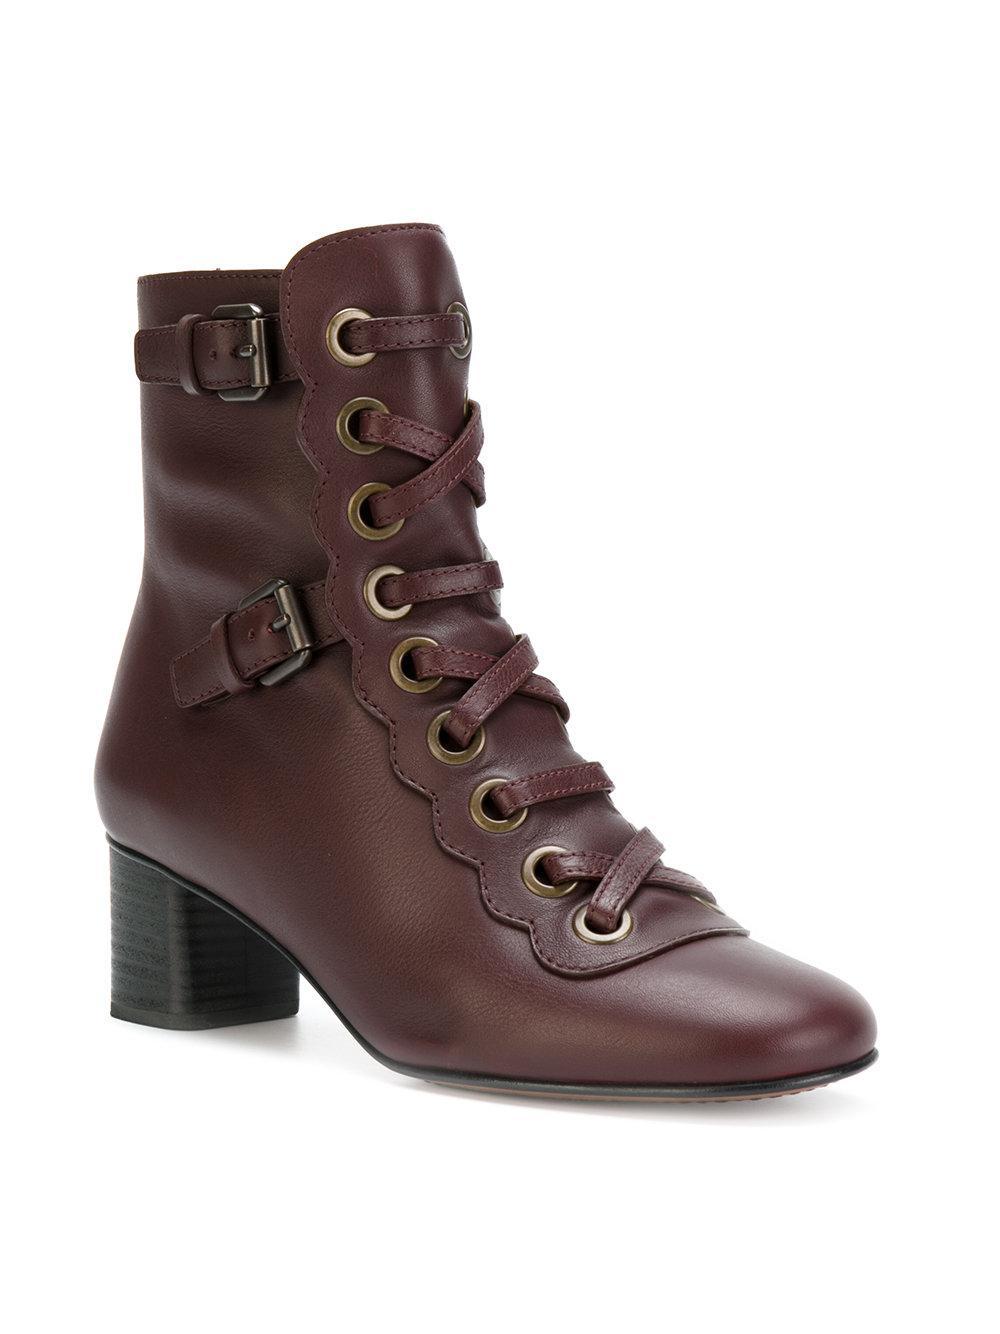 Orson lace-up boots - Pink & Purple Chlo�� kX6amLx